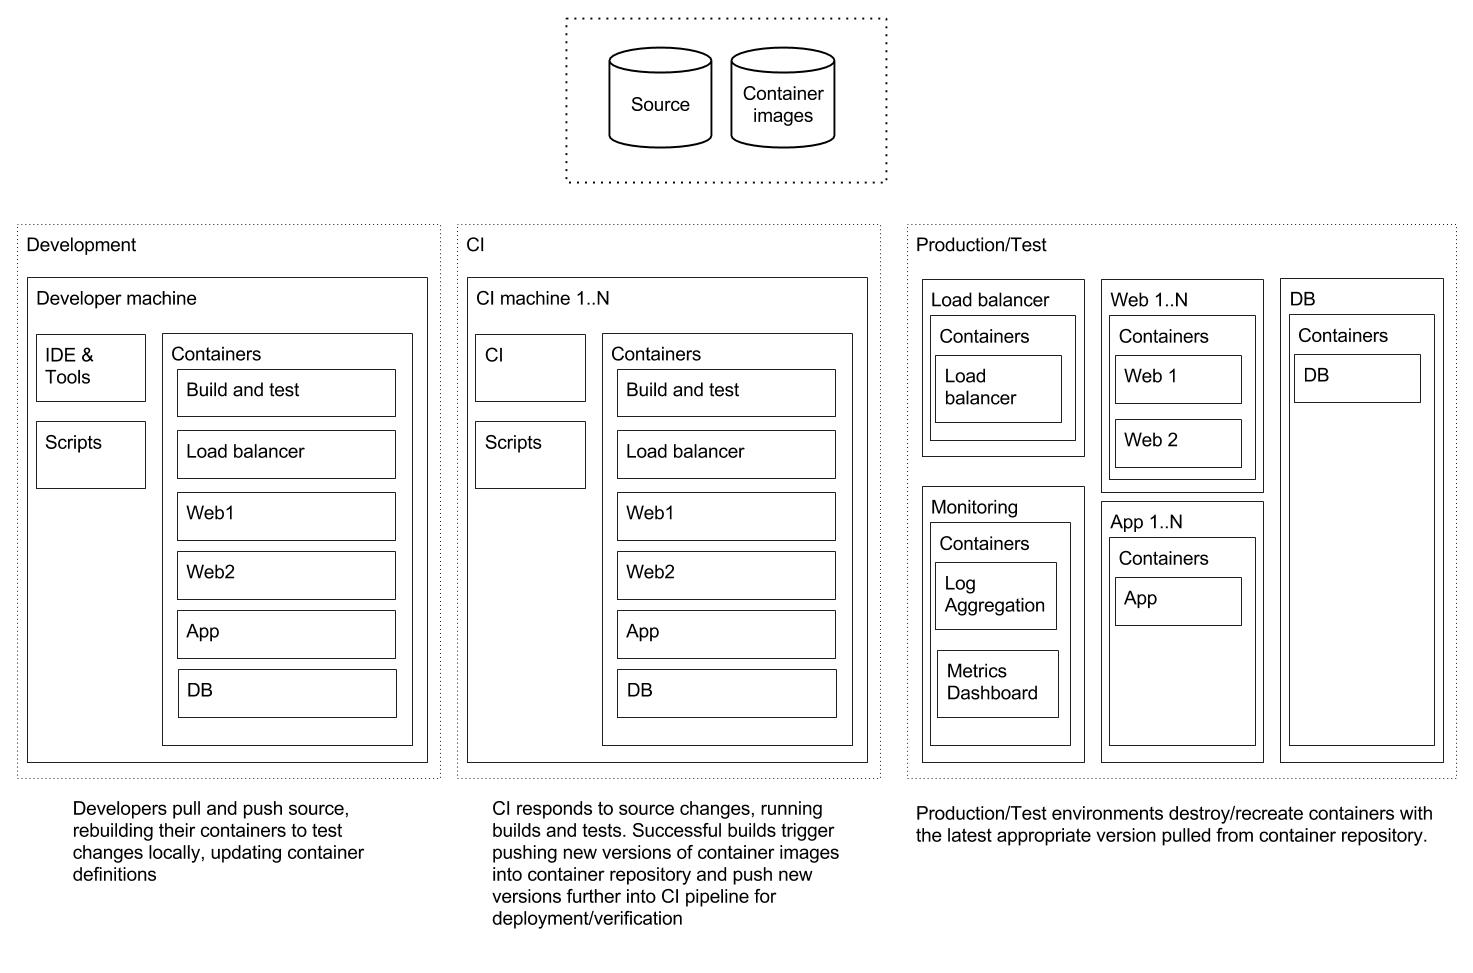 Container development environment diagram